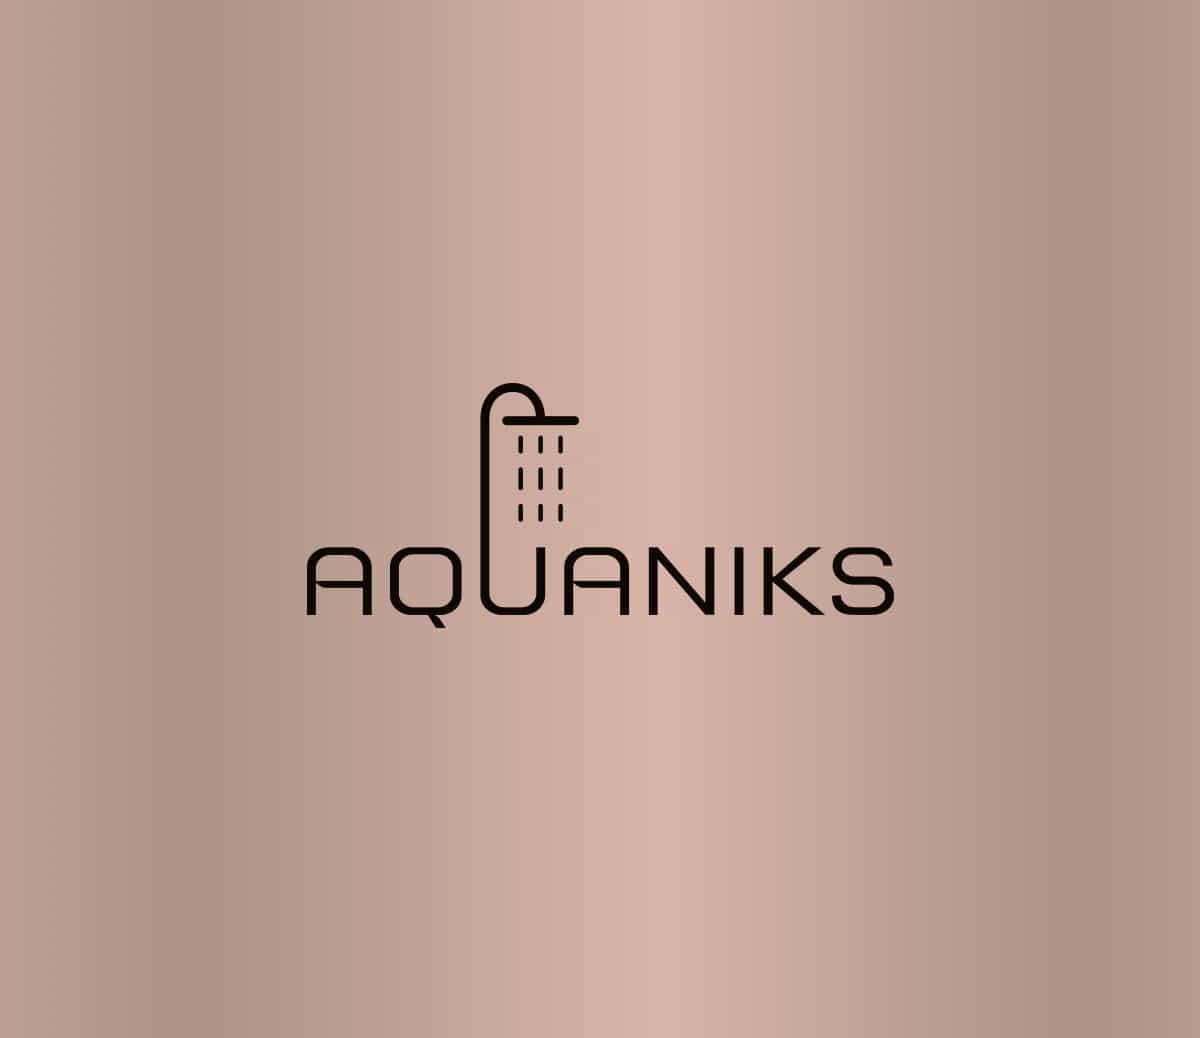 aquaniks3